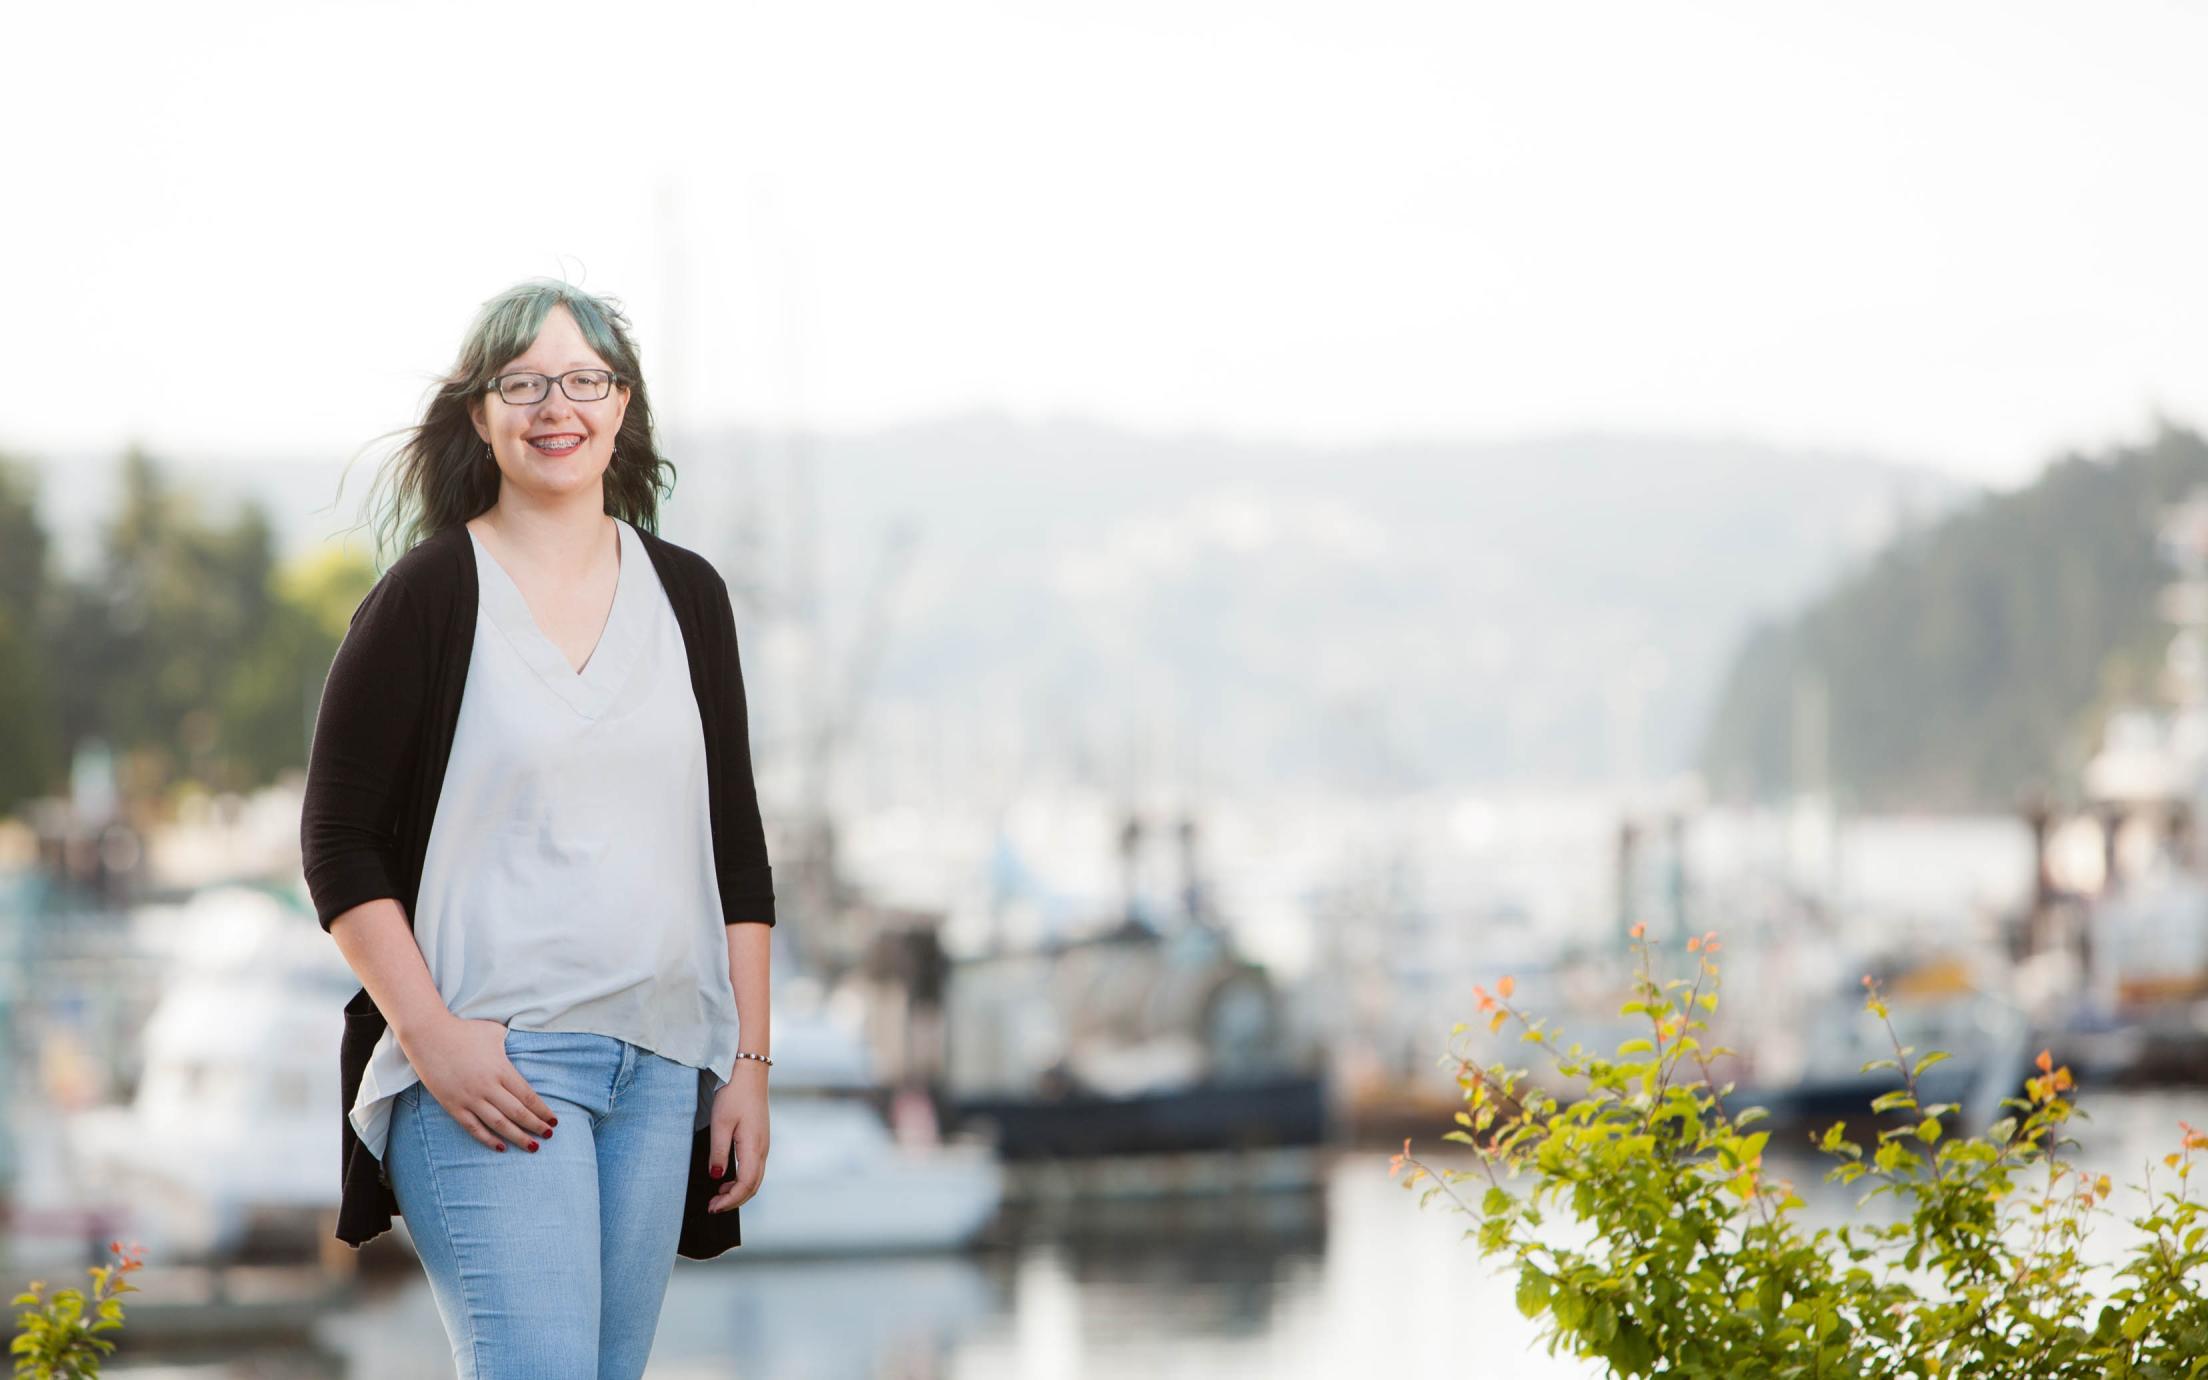 Exploratory University Studies Student, Kyra Egan, exploring Nainaimo